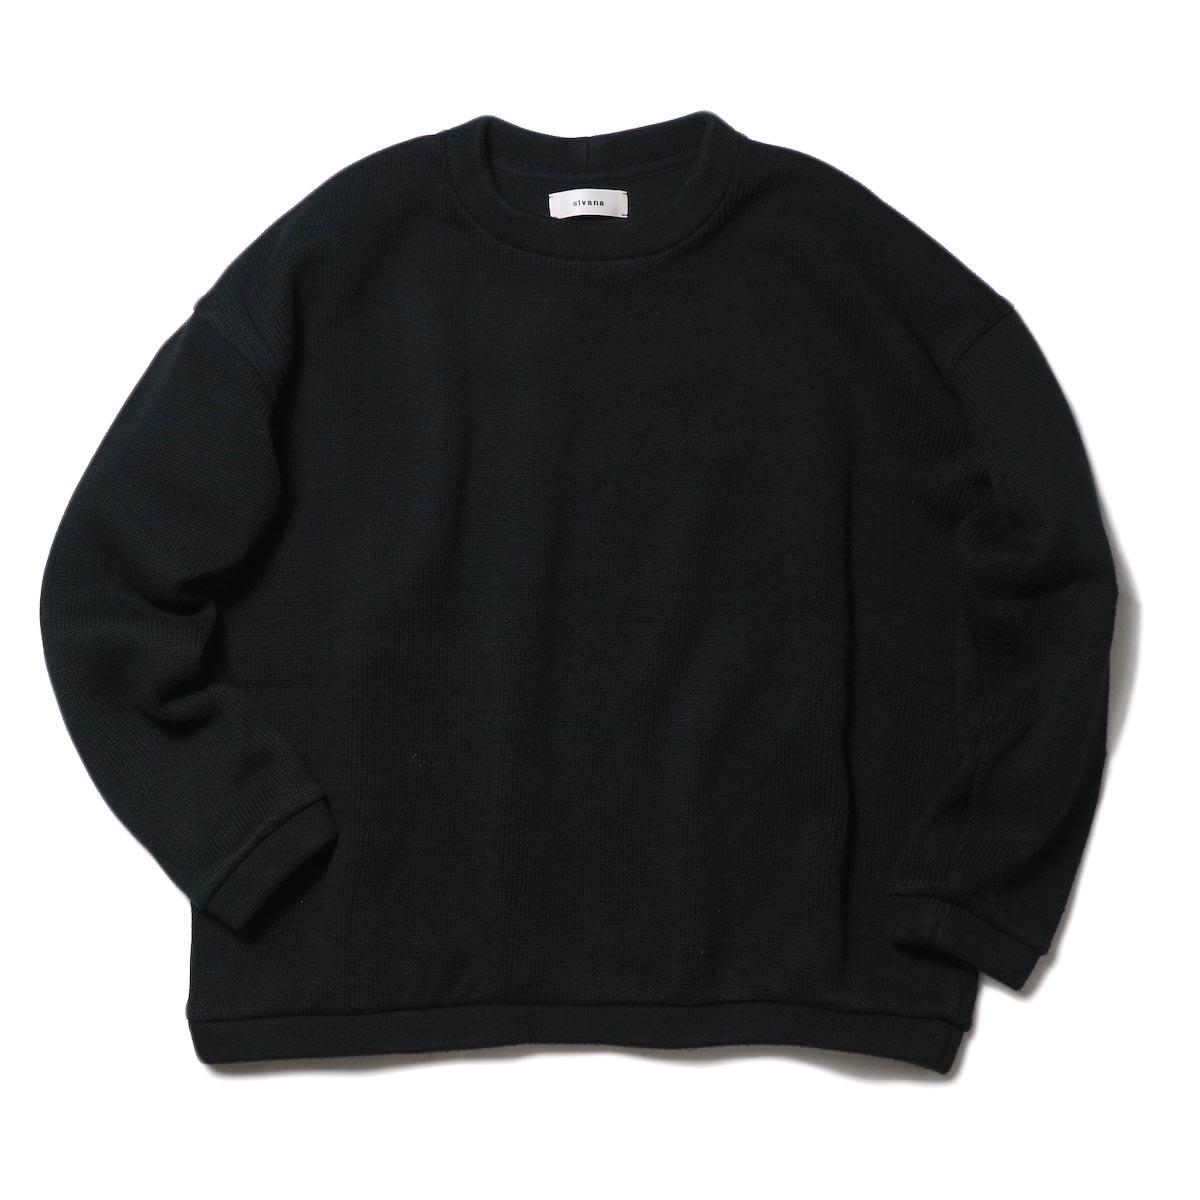 alvana / RIB KNIT CREWNECK P/O (Black) 正面